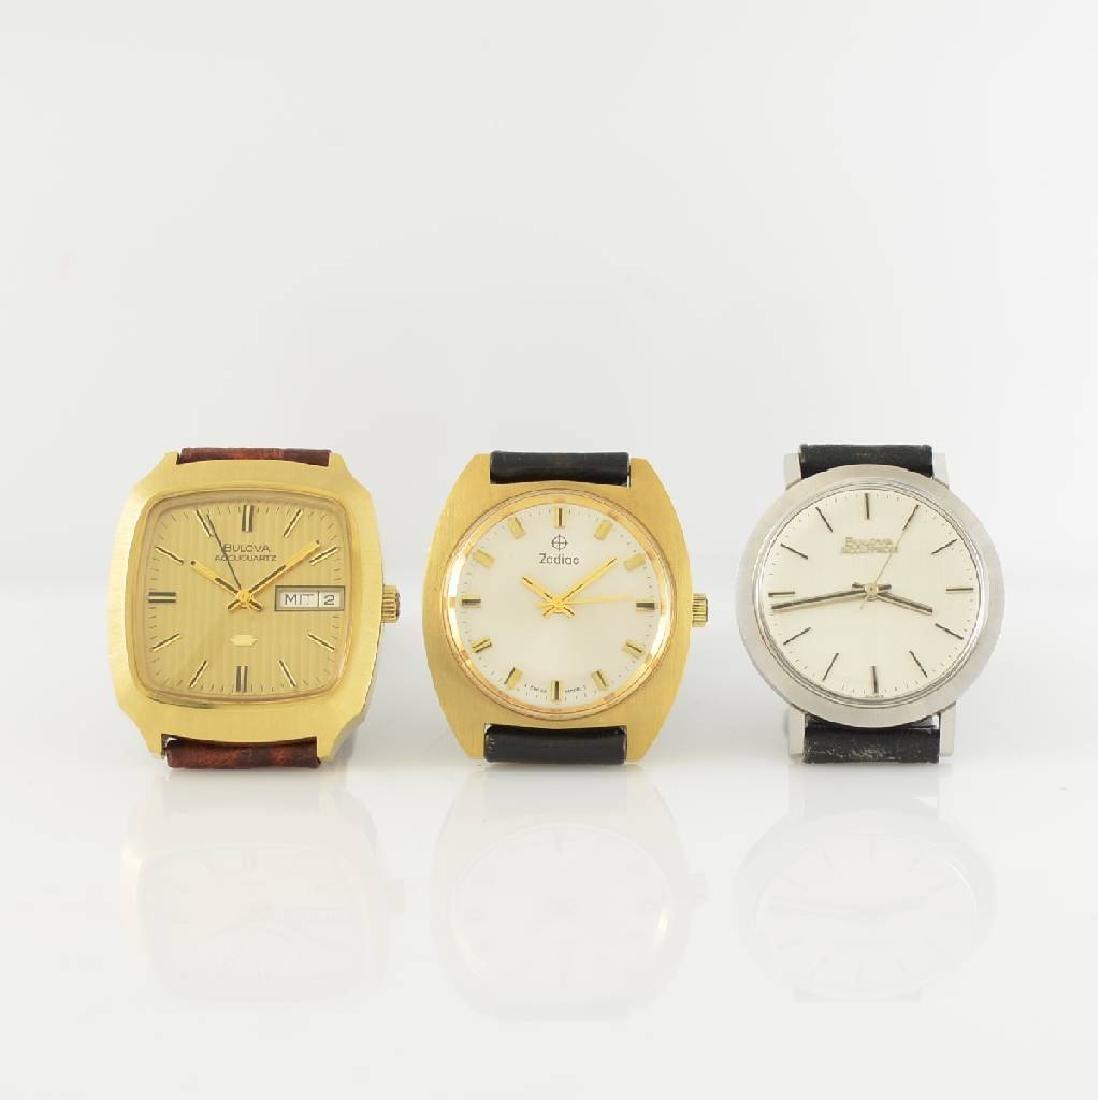 Set of 3 unworn gents wristwatches